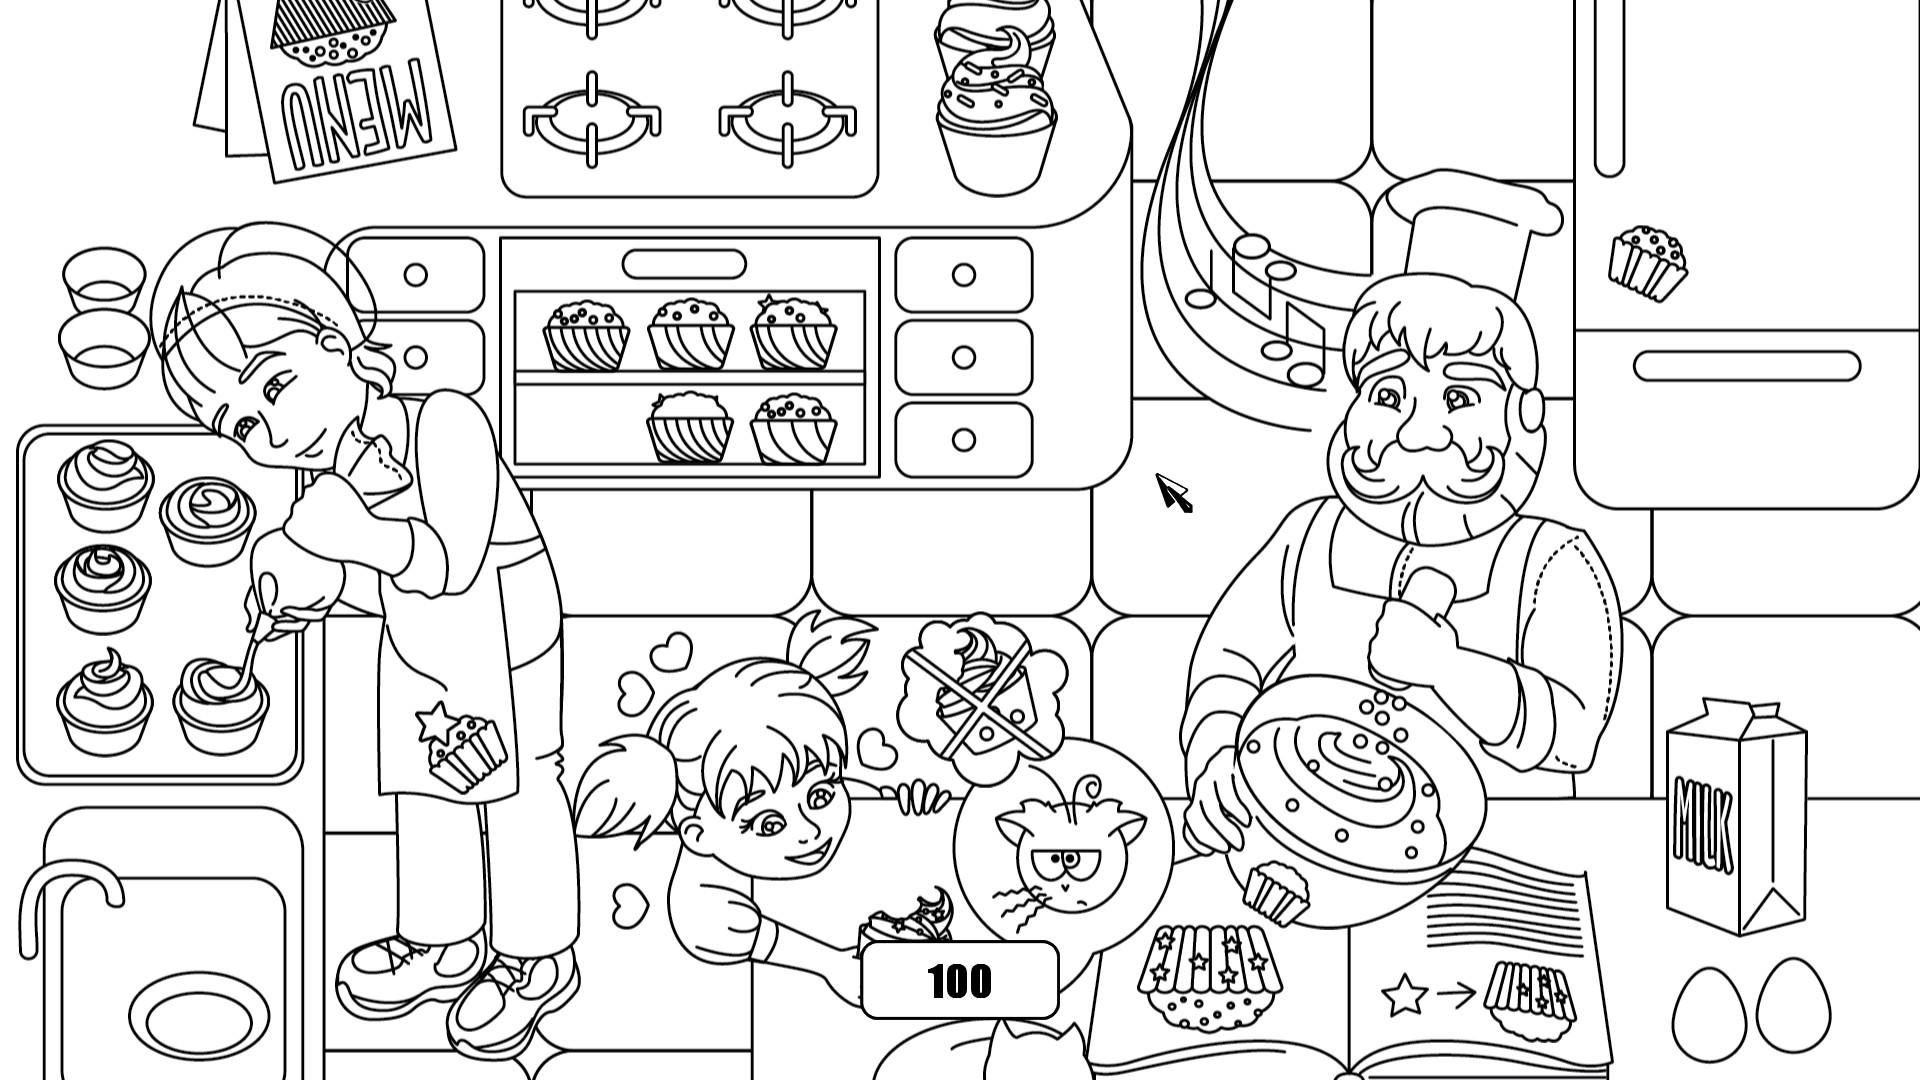 100 hidden cupcakes screenshot